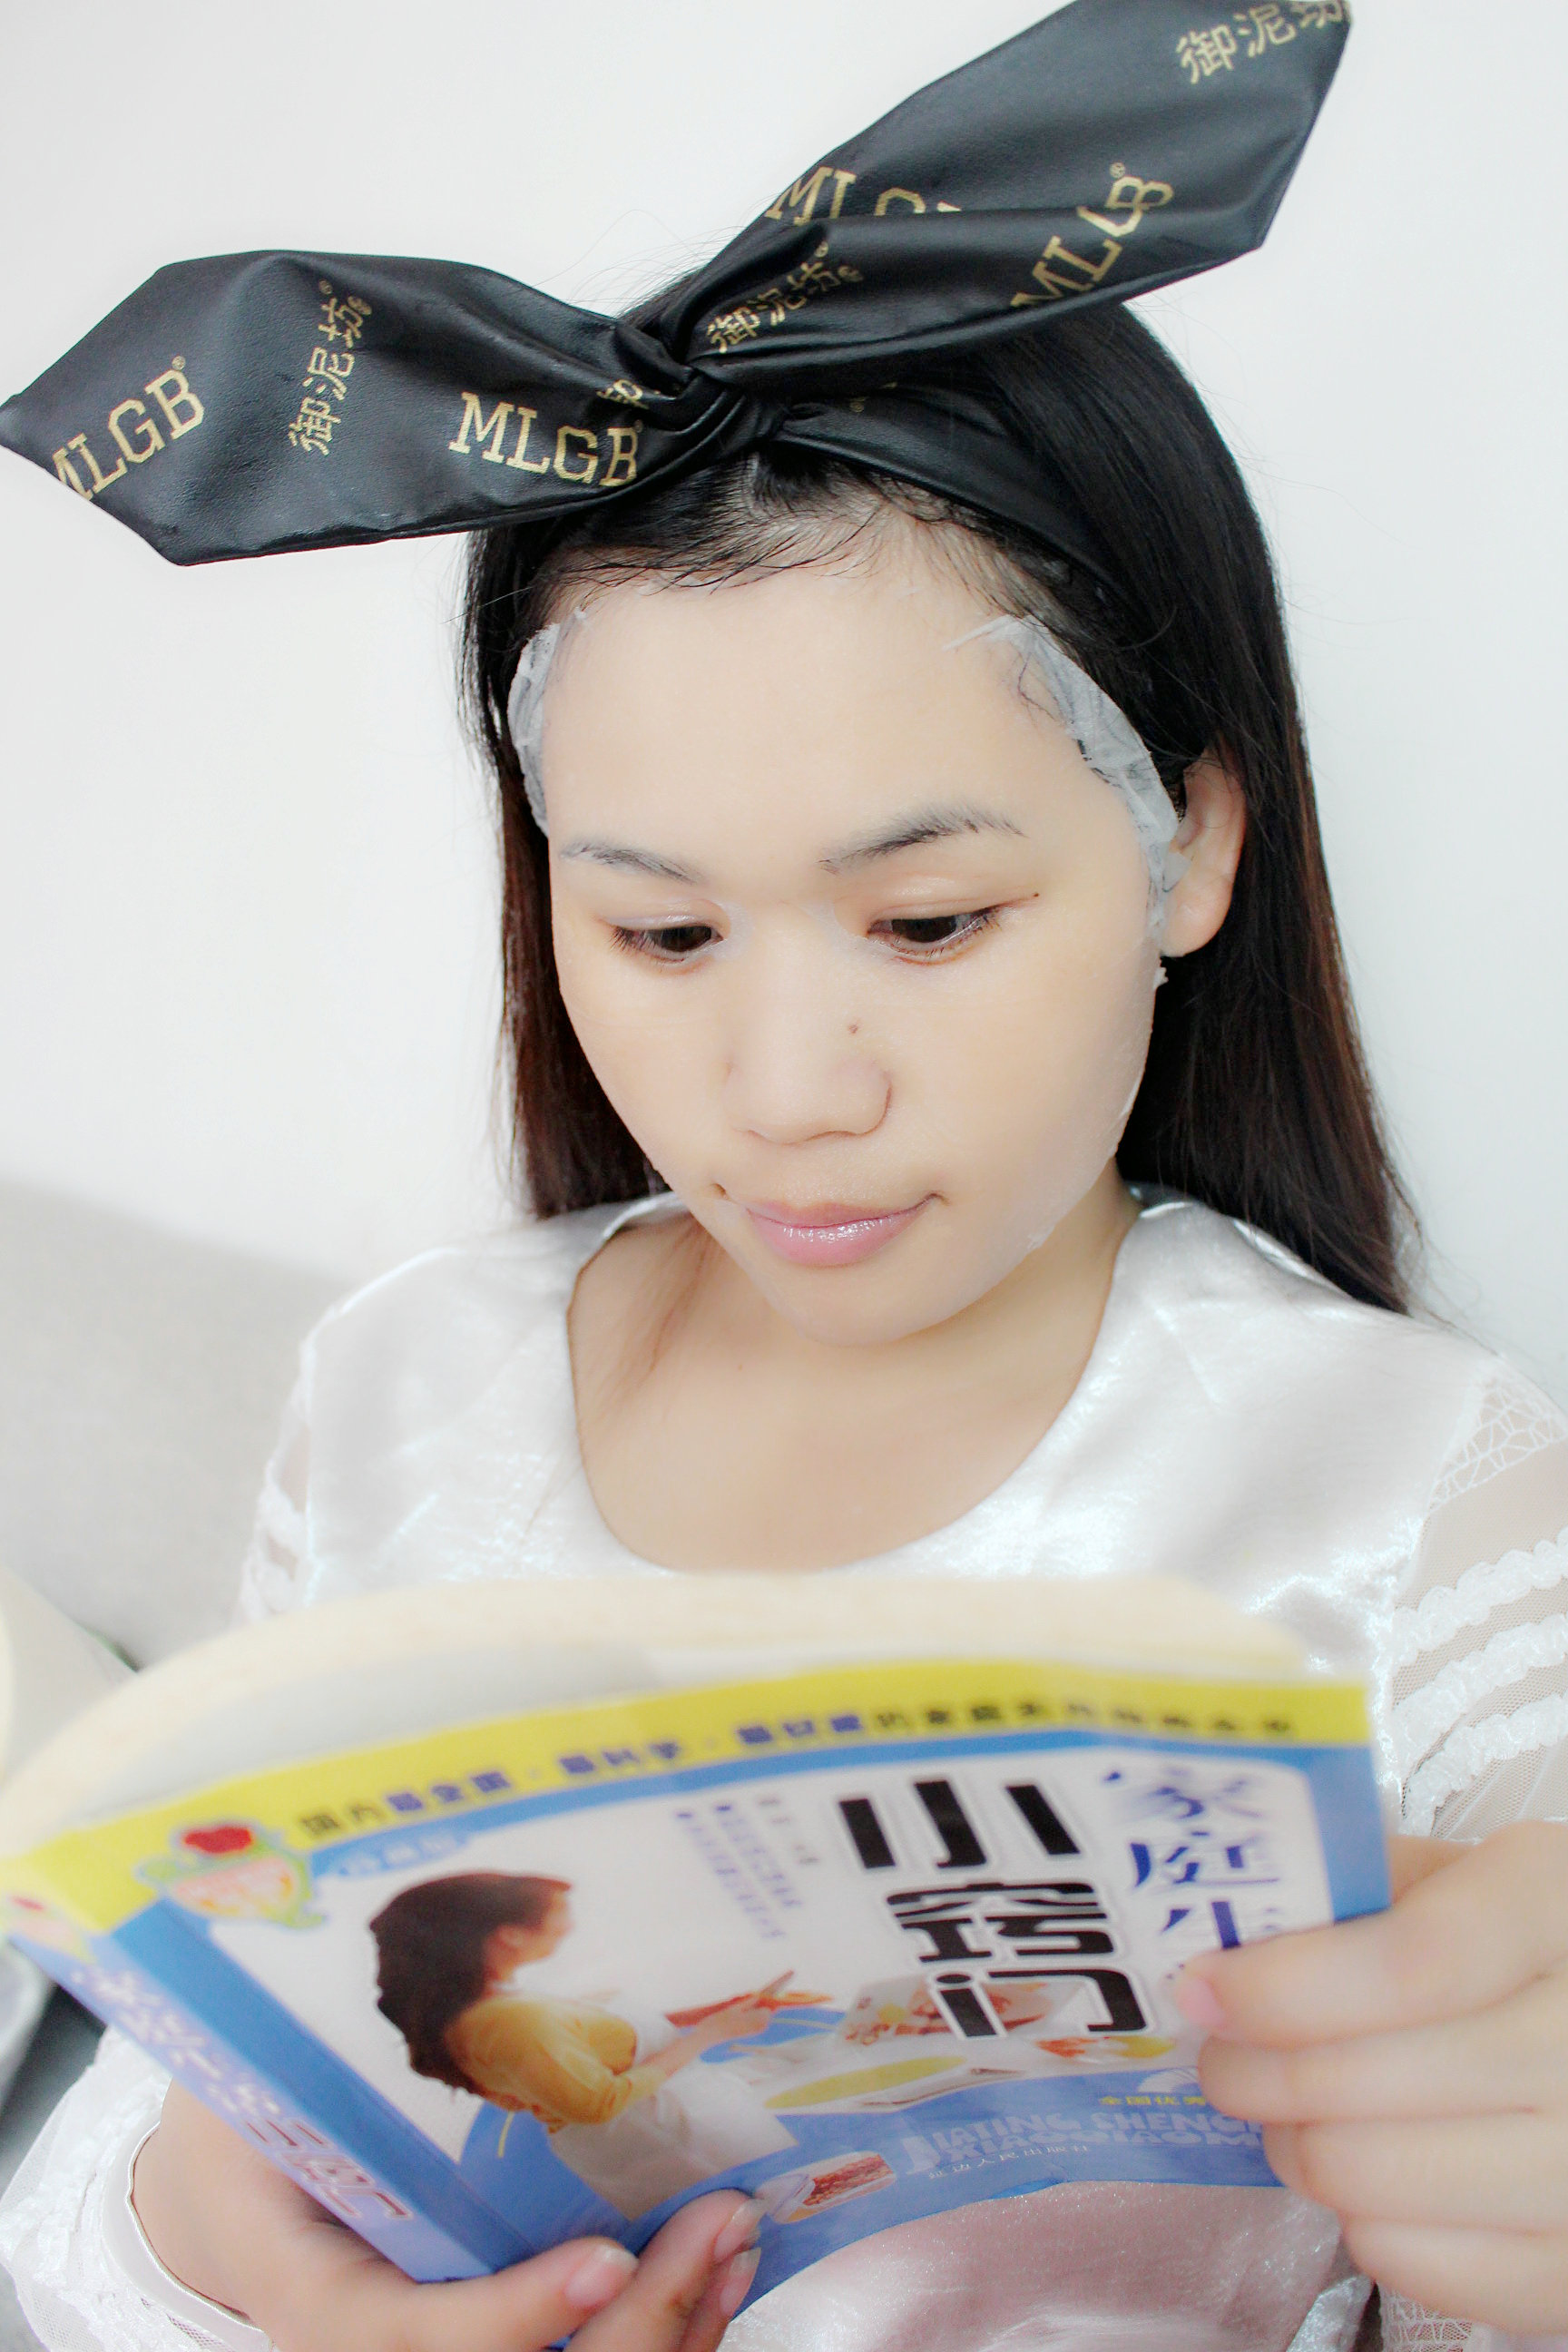 【Rita希媛】发箍妆容创意秀,套上发箍萌萌哒! - Rita希媛 - Rita希媛的小窝